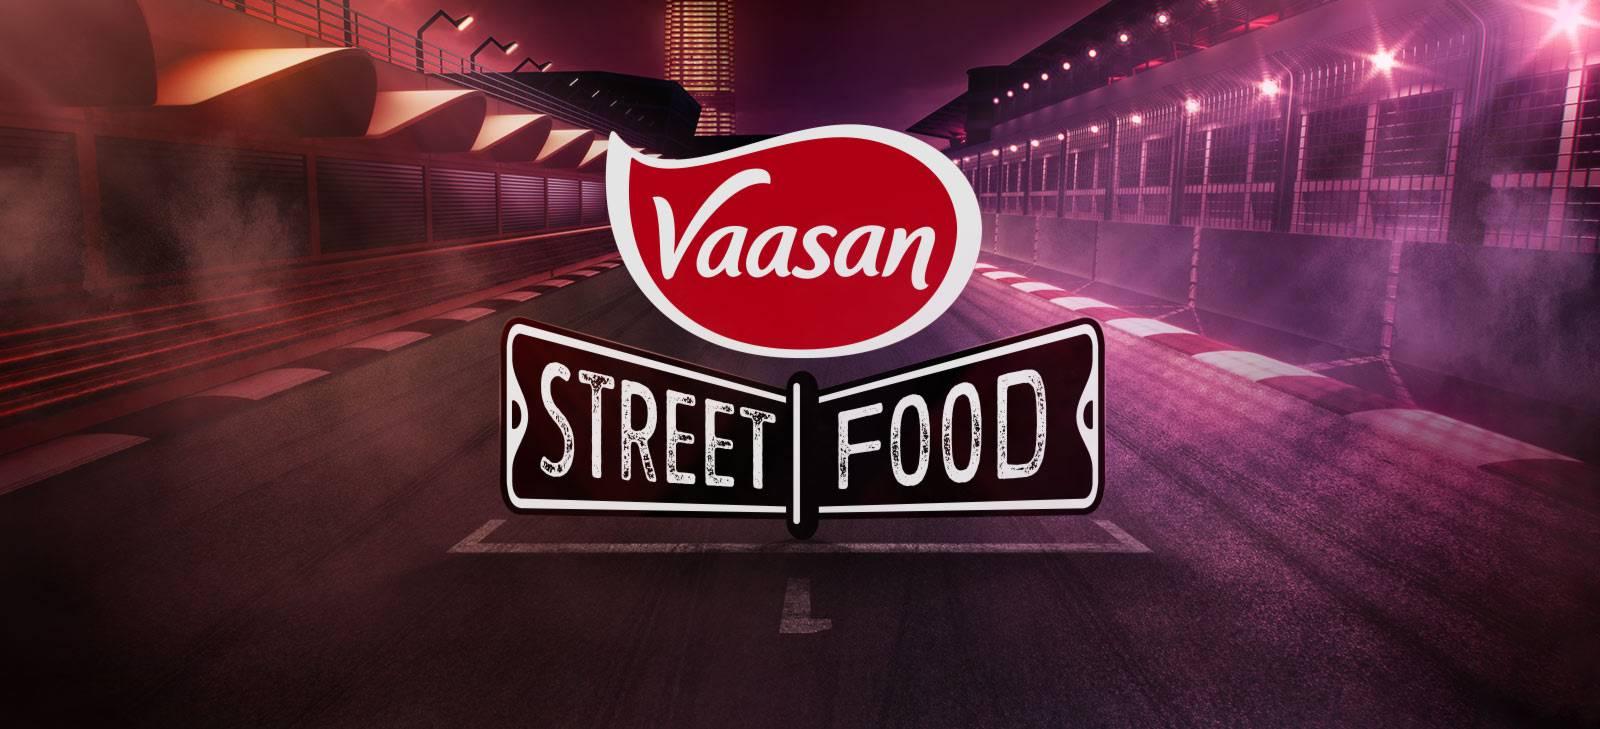 Vaasan Street Food